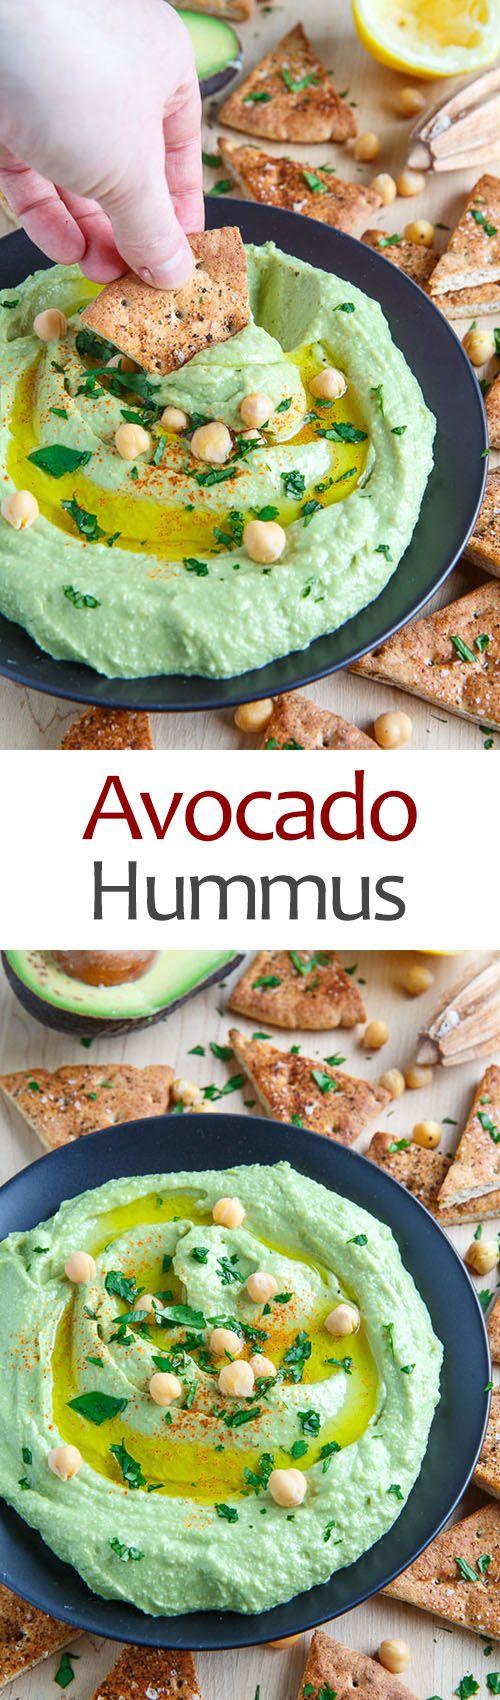 Avocado Hummus